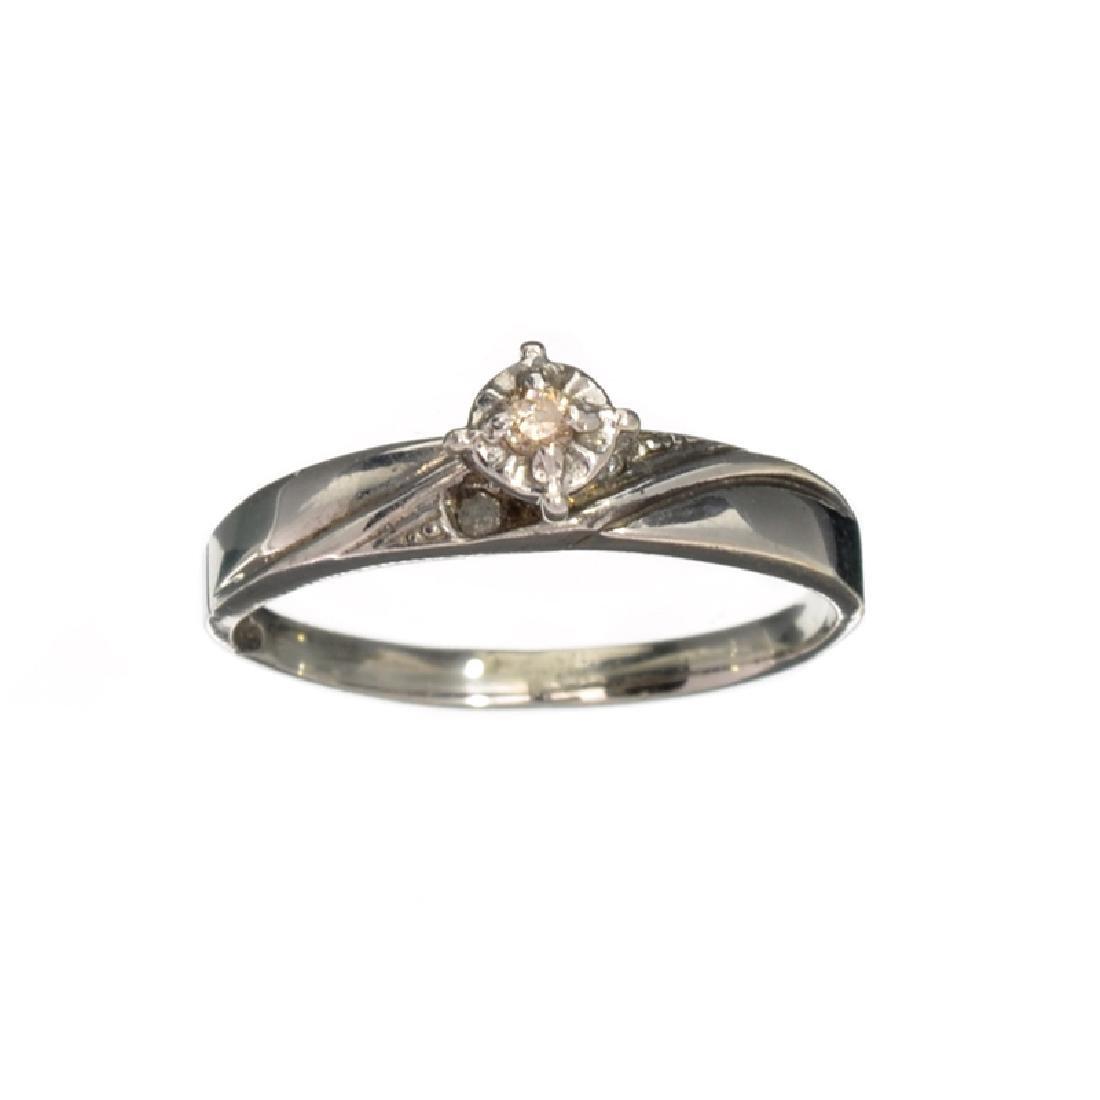 APP: 0.3k Fine Jewelry 0.07CT Briiliant Cut Diamond And